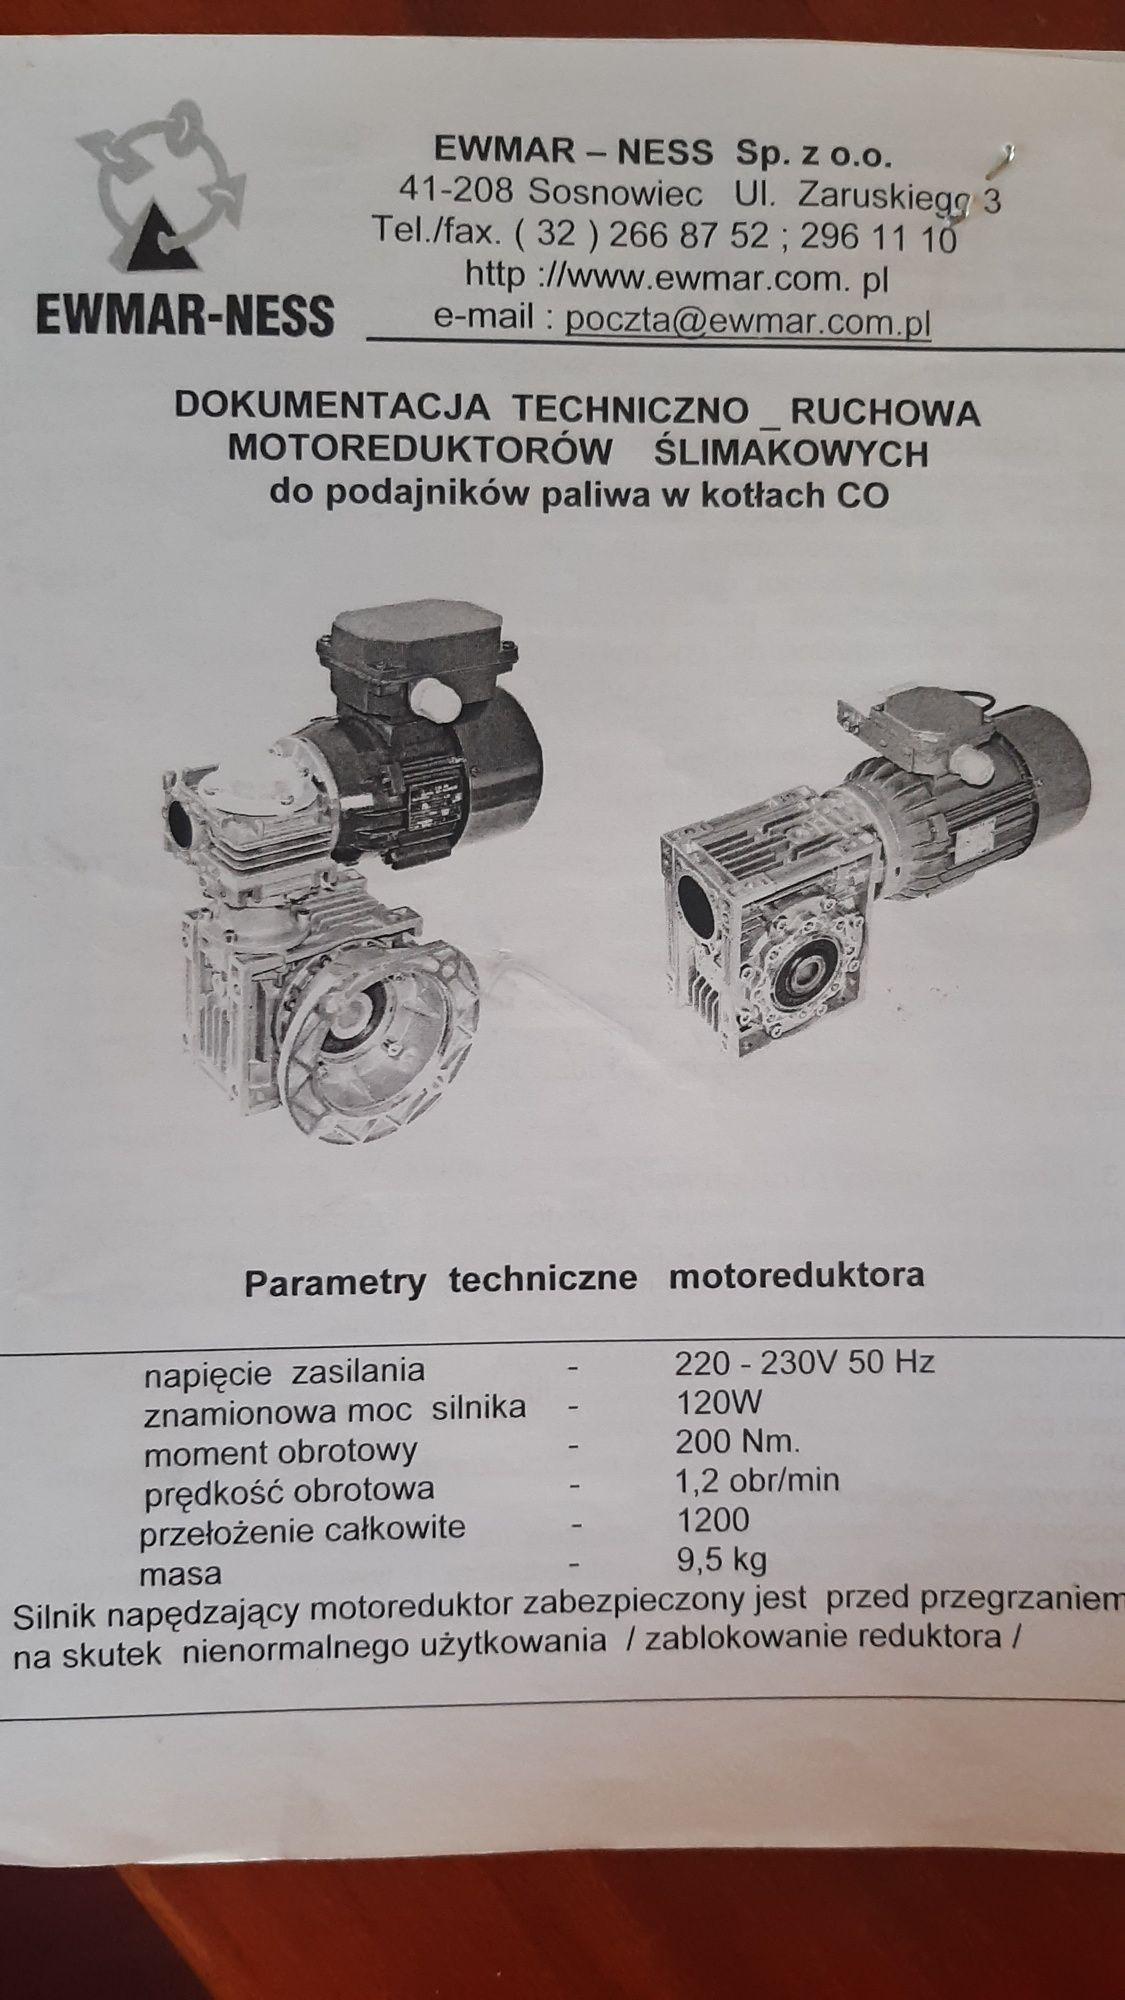 Motoreduktor ślimakowy